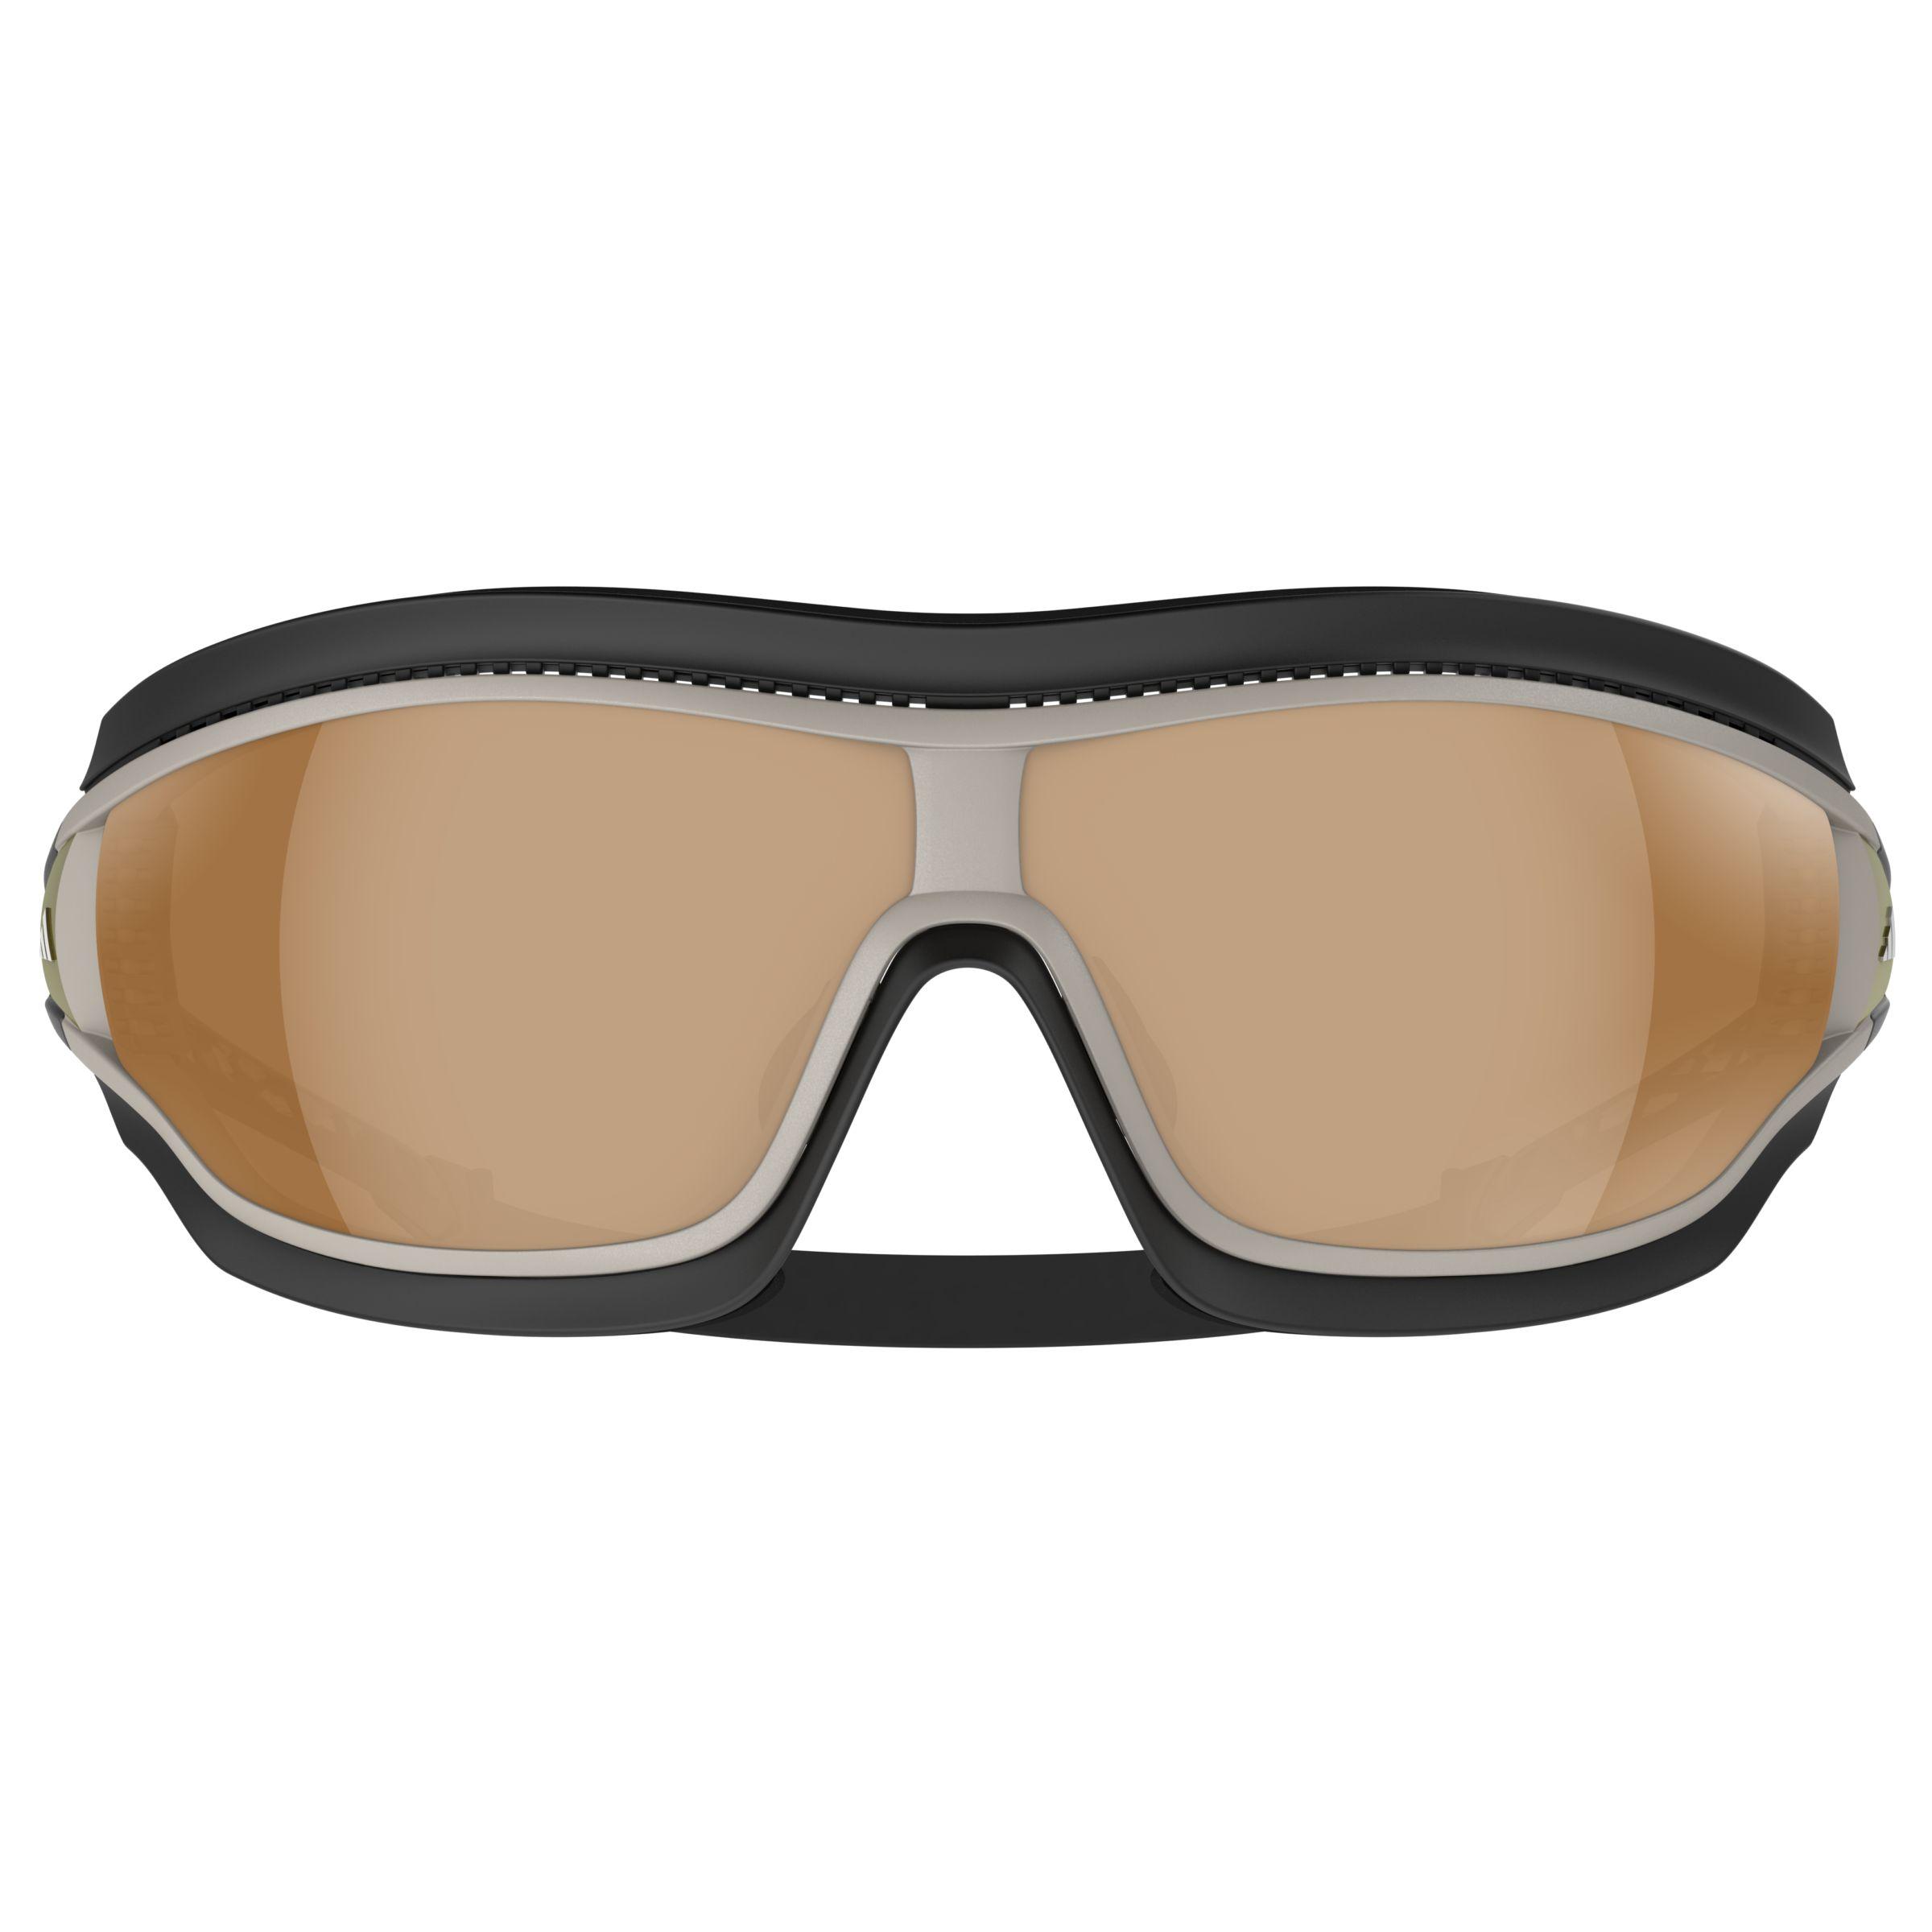 adidas tycane outdoor sportbrille